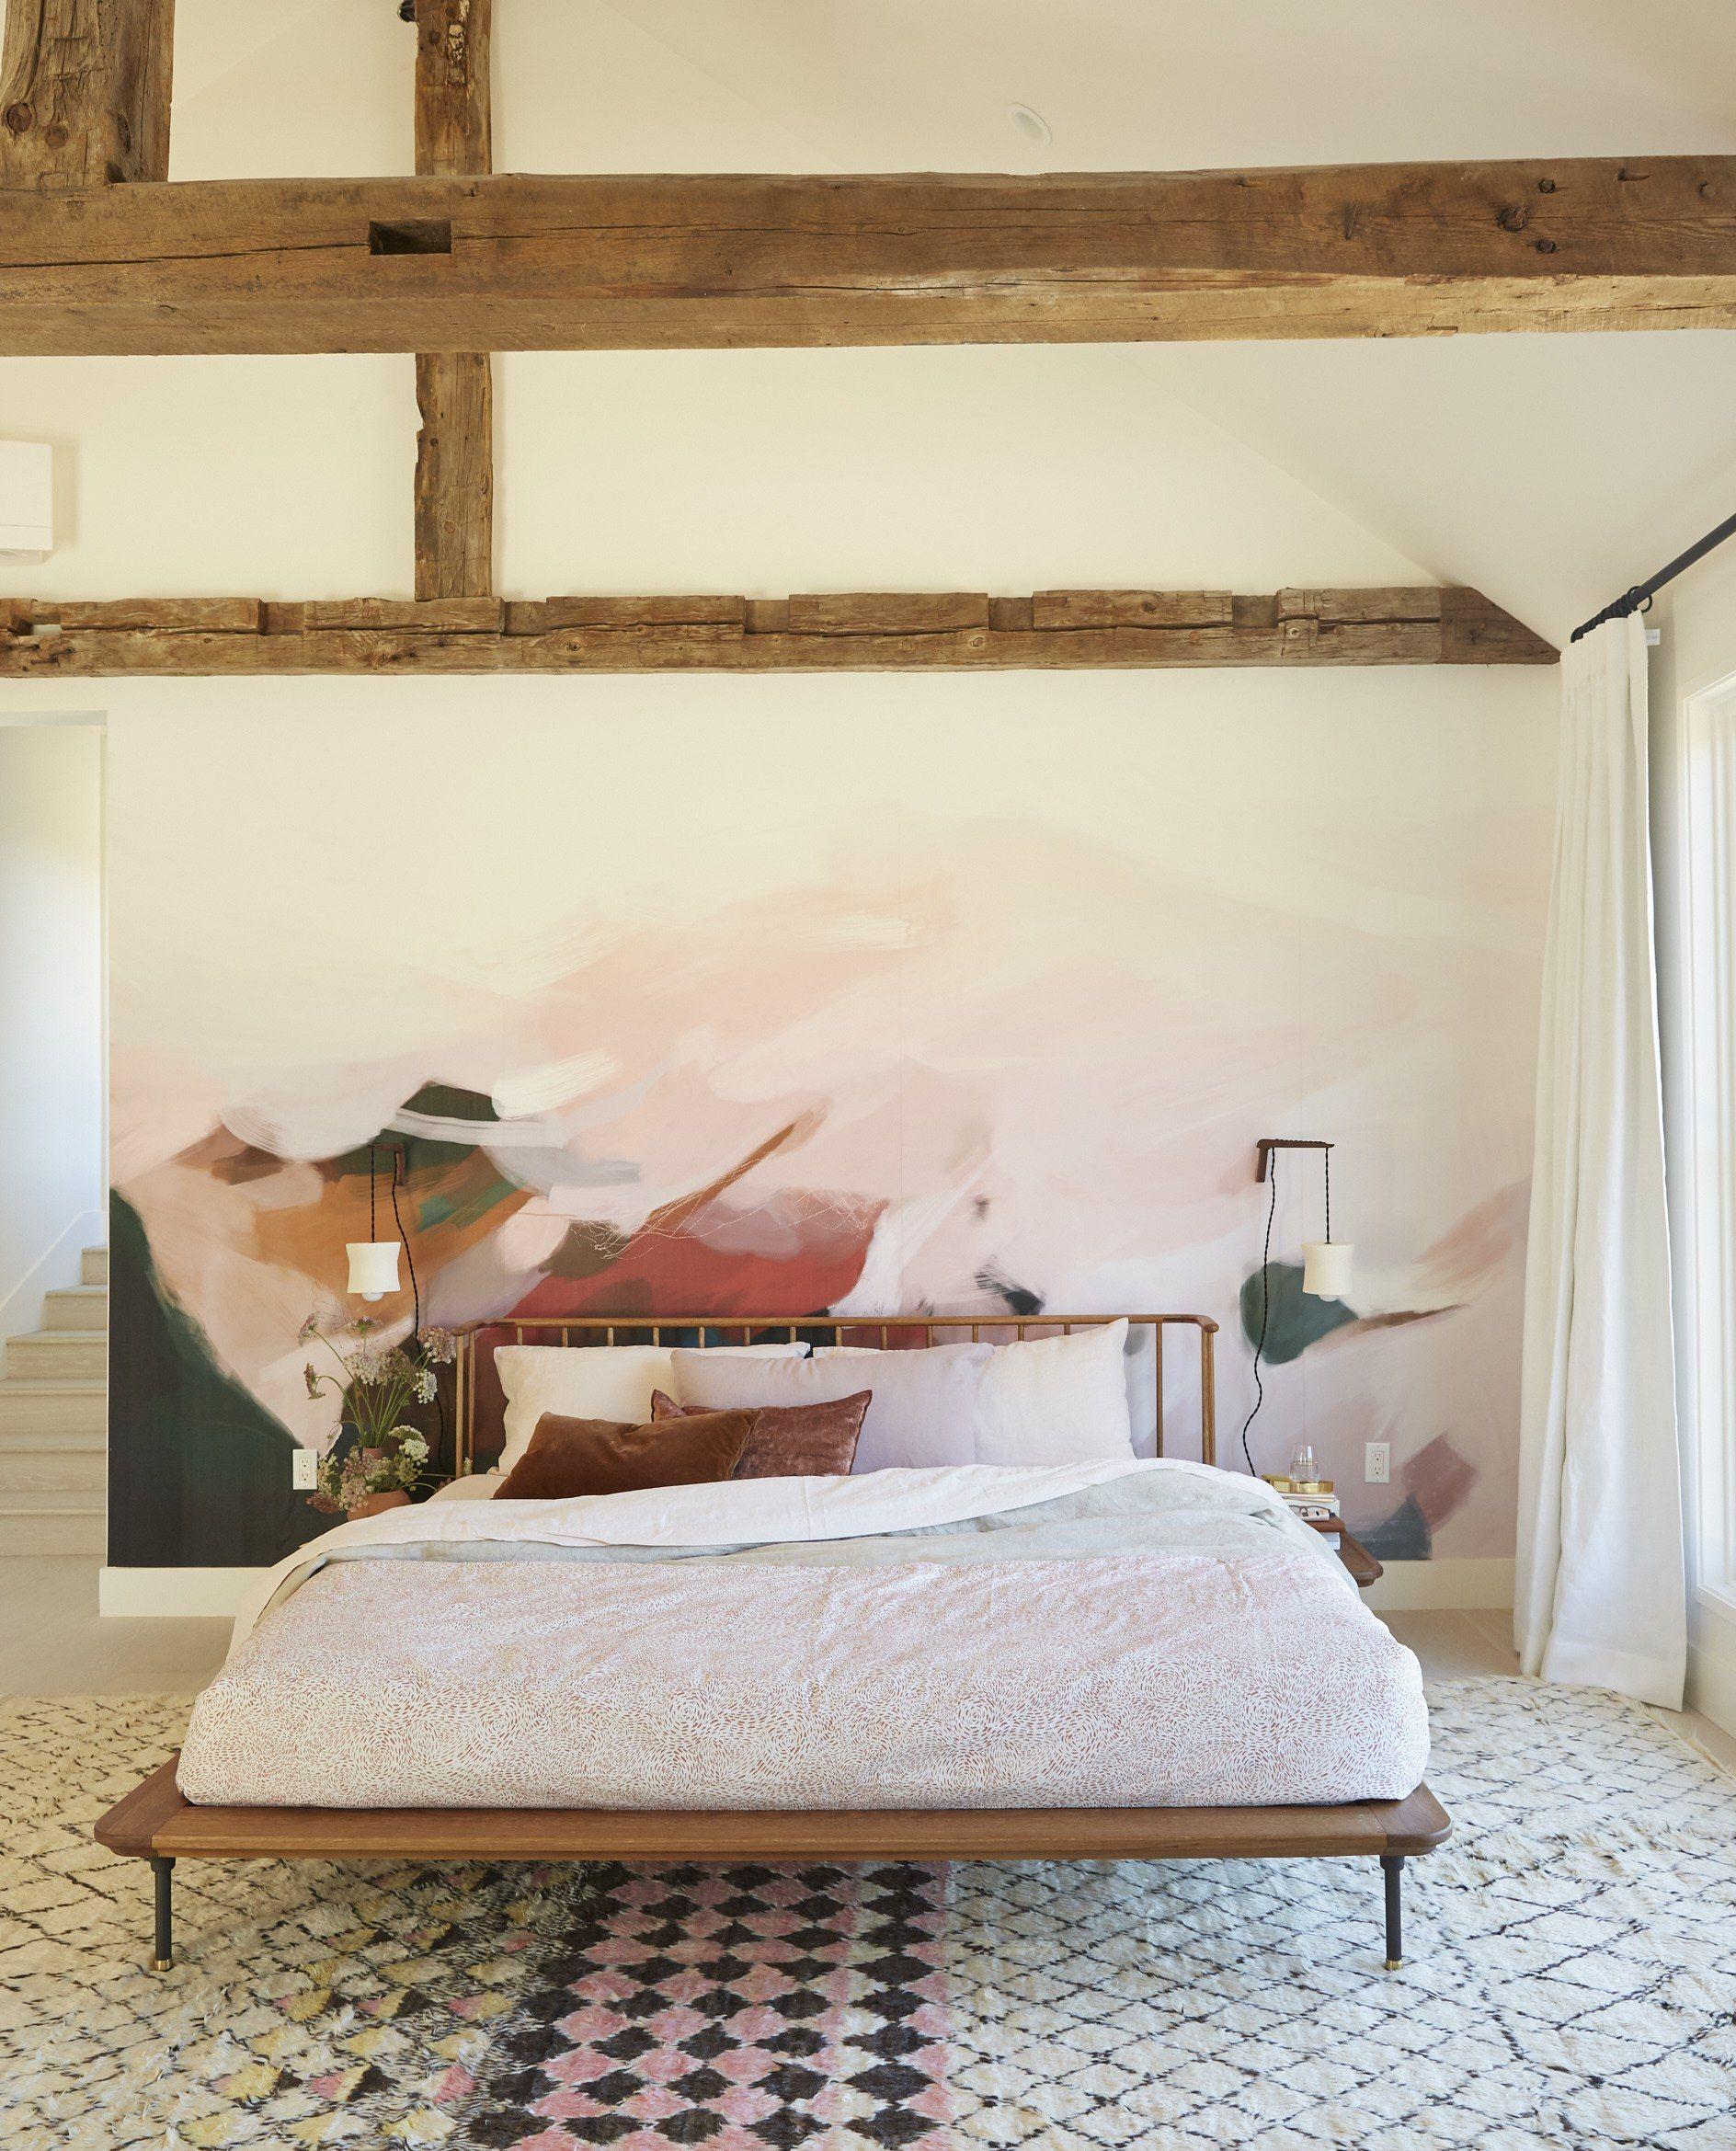 The Best Bedroom Decorating Ideas Home Decor Catalogs Discount Home Decor New Home Essentials